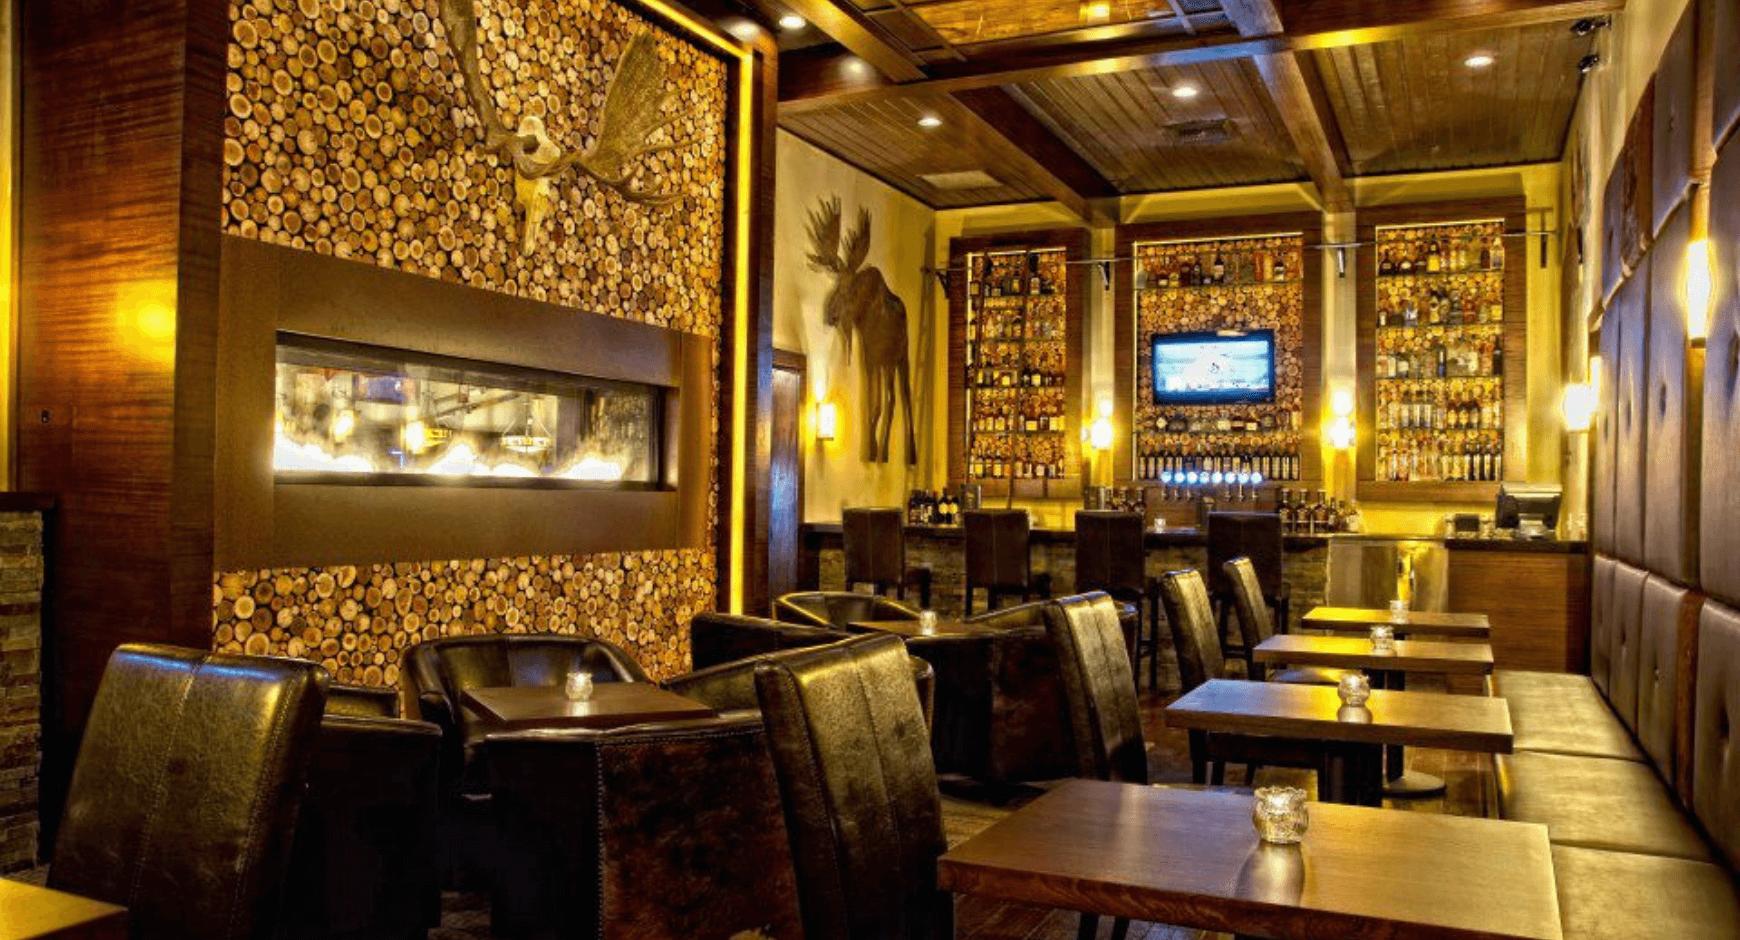 hotel interior design trends for restaurants